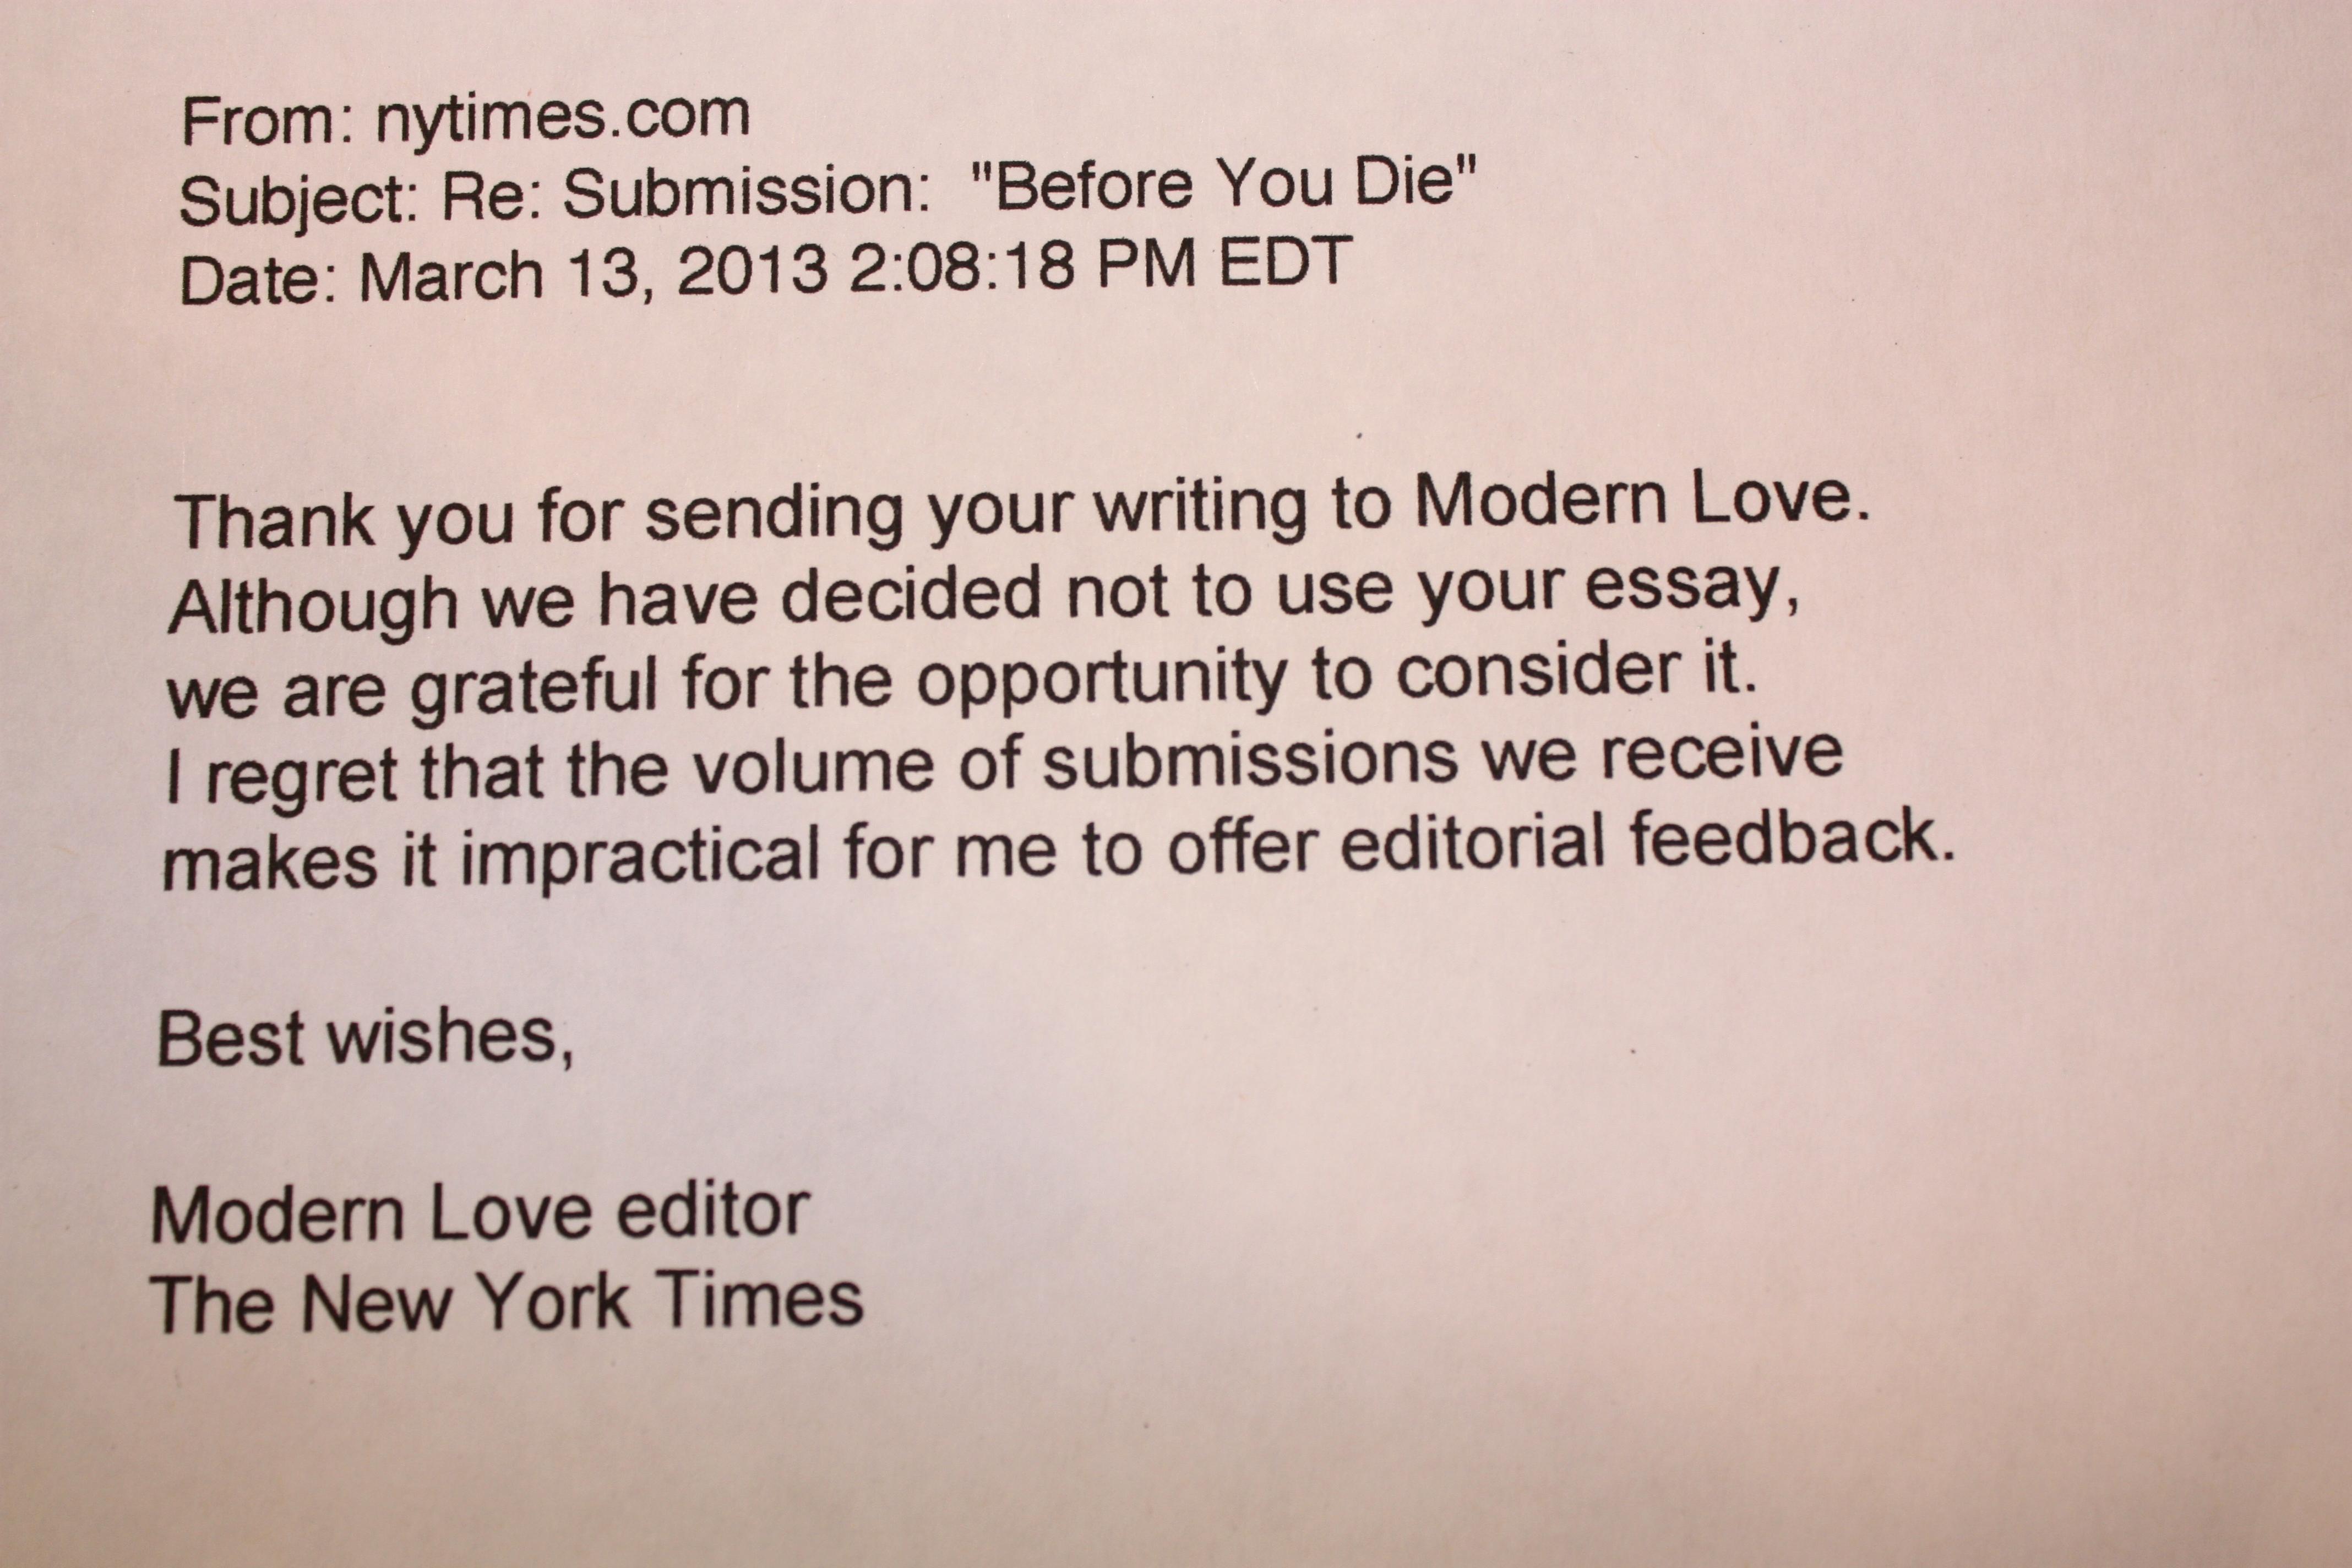 008 Essay Example Img 1382 Modern Love Phenomenal Essays Contest Winner Amy Rosenthal Full